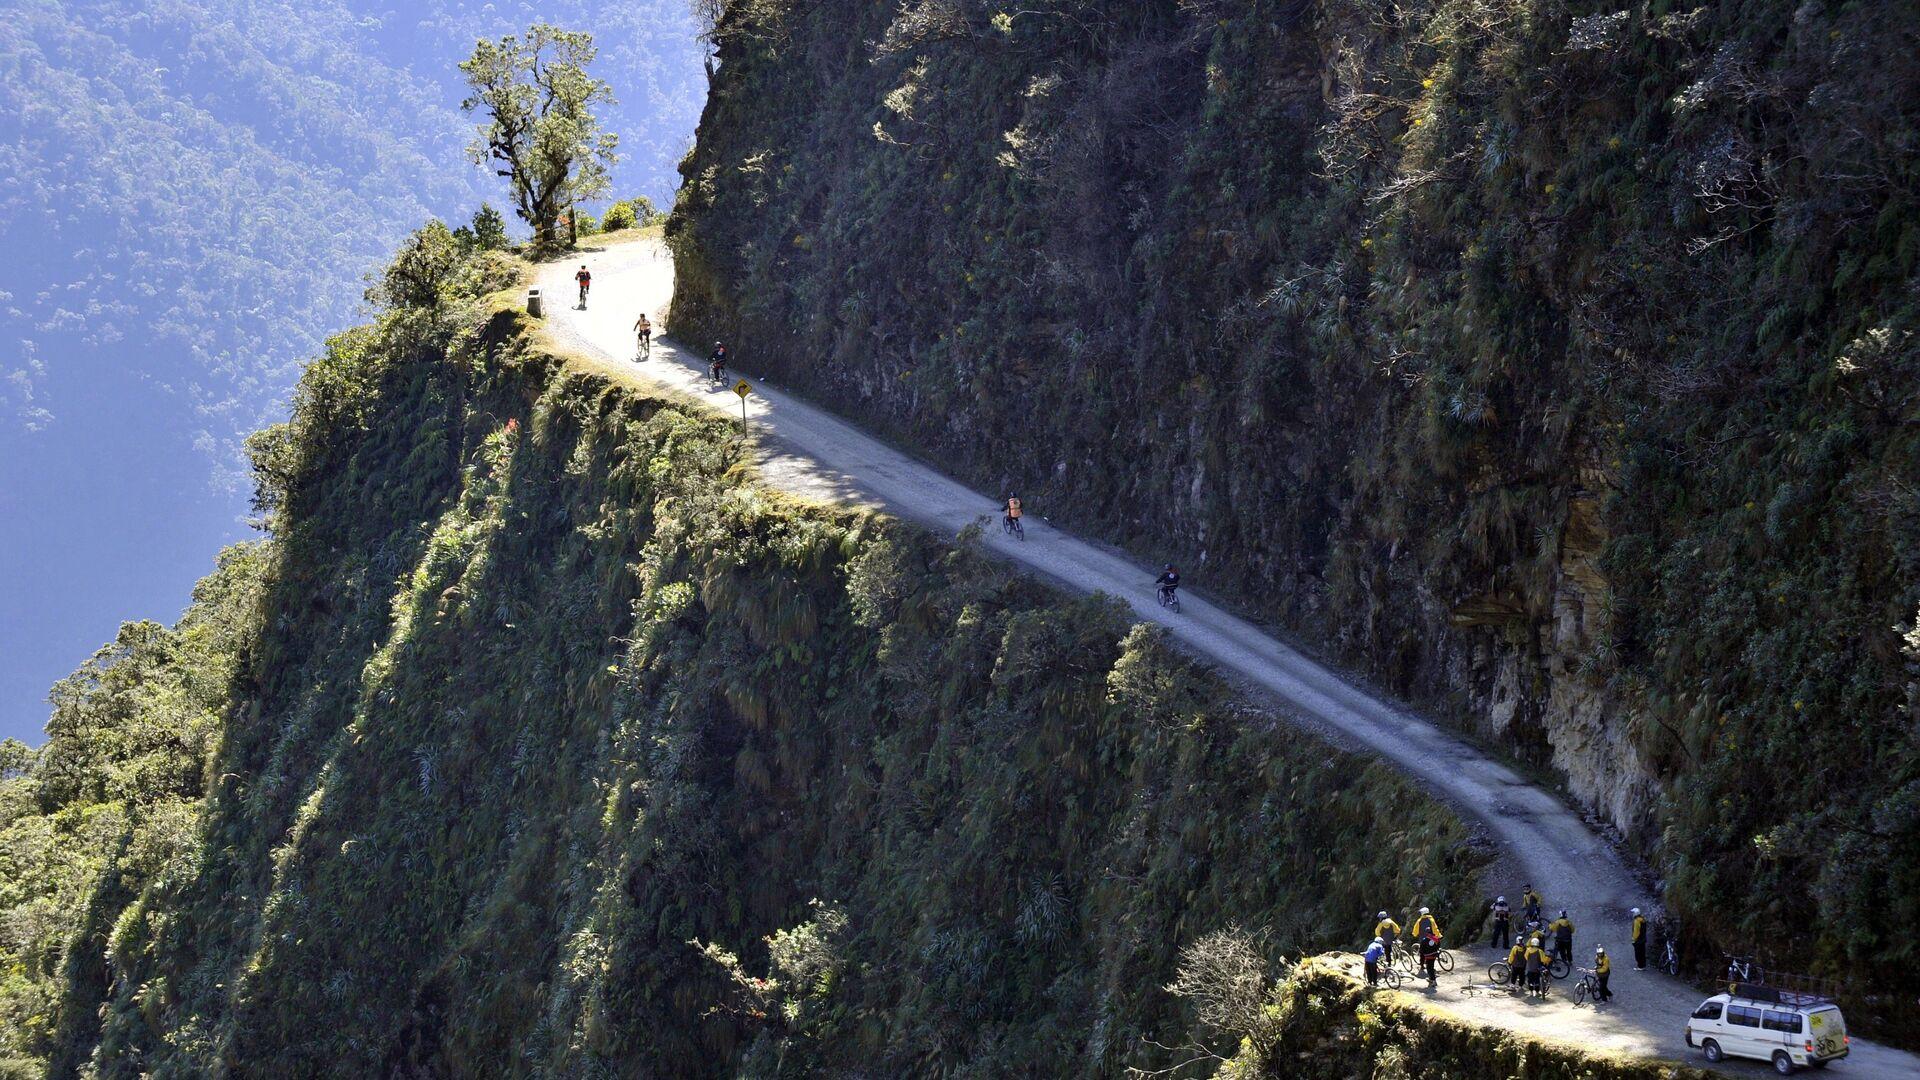 Горная дорога в Боливии - РИА Новости, 1920, 13.07.2021